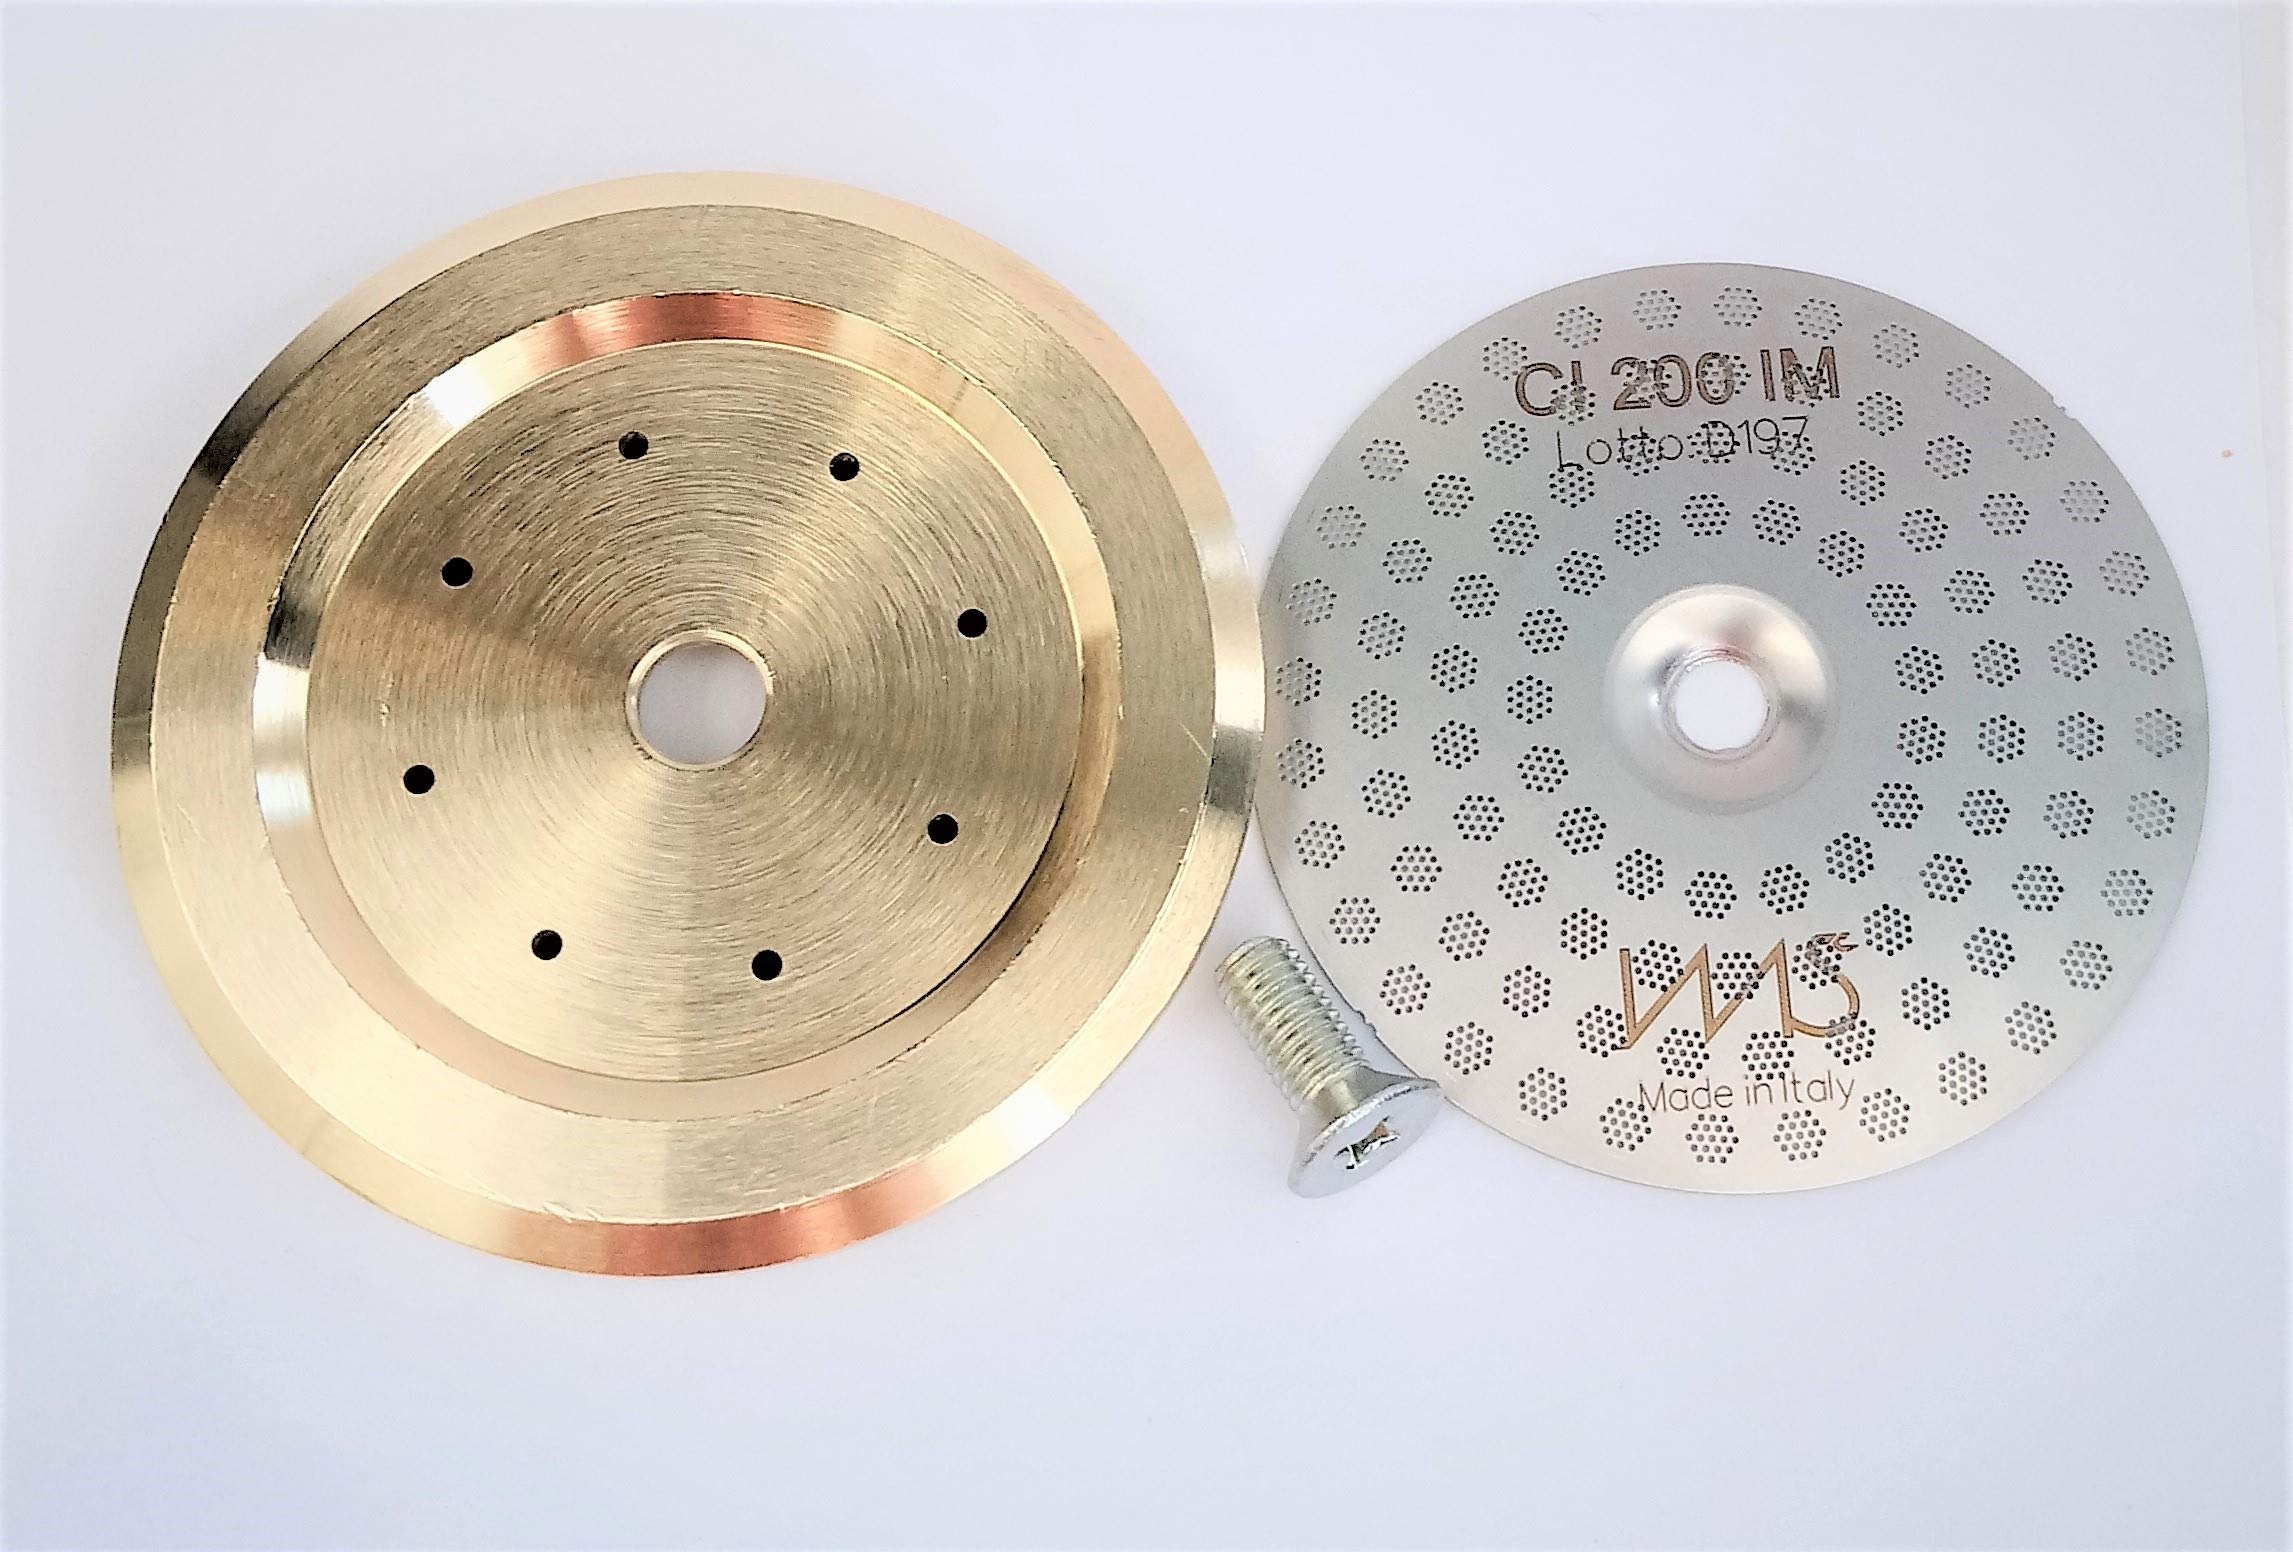 Breville shower screen and inner holder. Custom tune up kit for 58mm Breville BES900XL BES920XL BES980XL. IMS Precision Shower Screen and Brass inner holder by VeryBarista (Image #4)